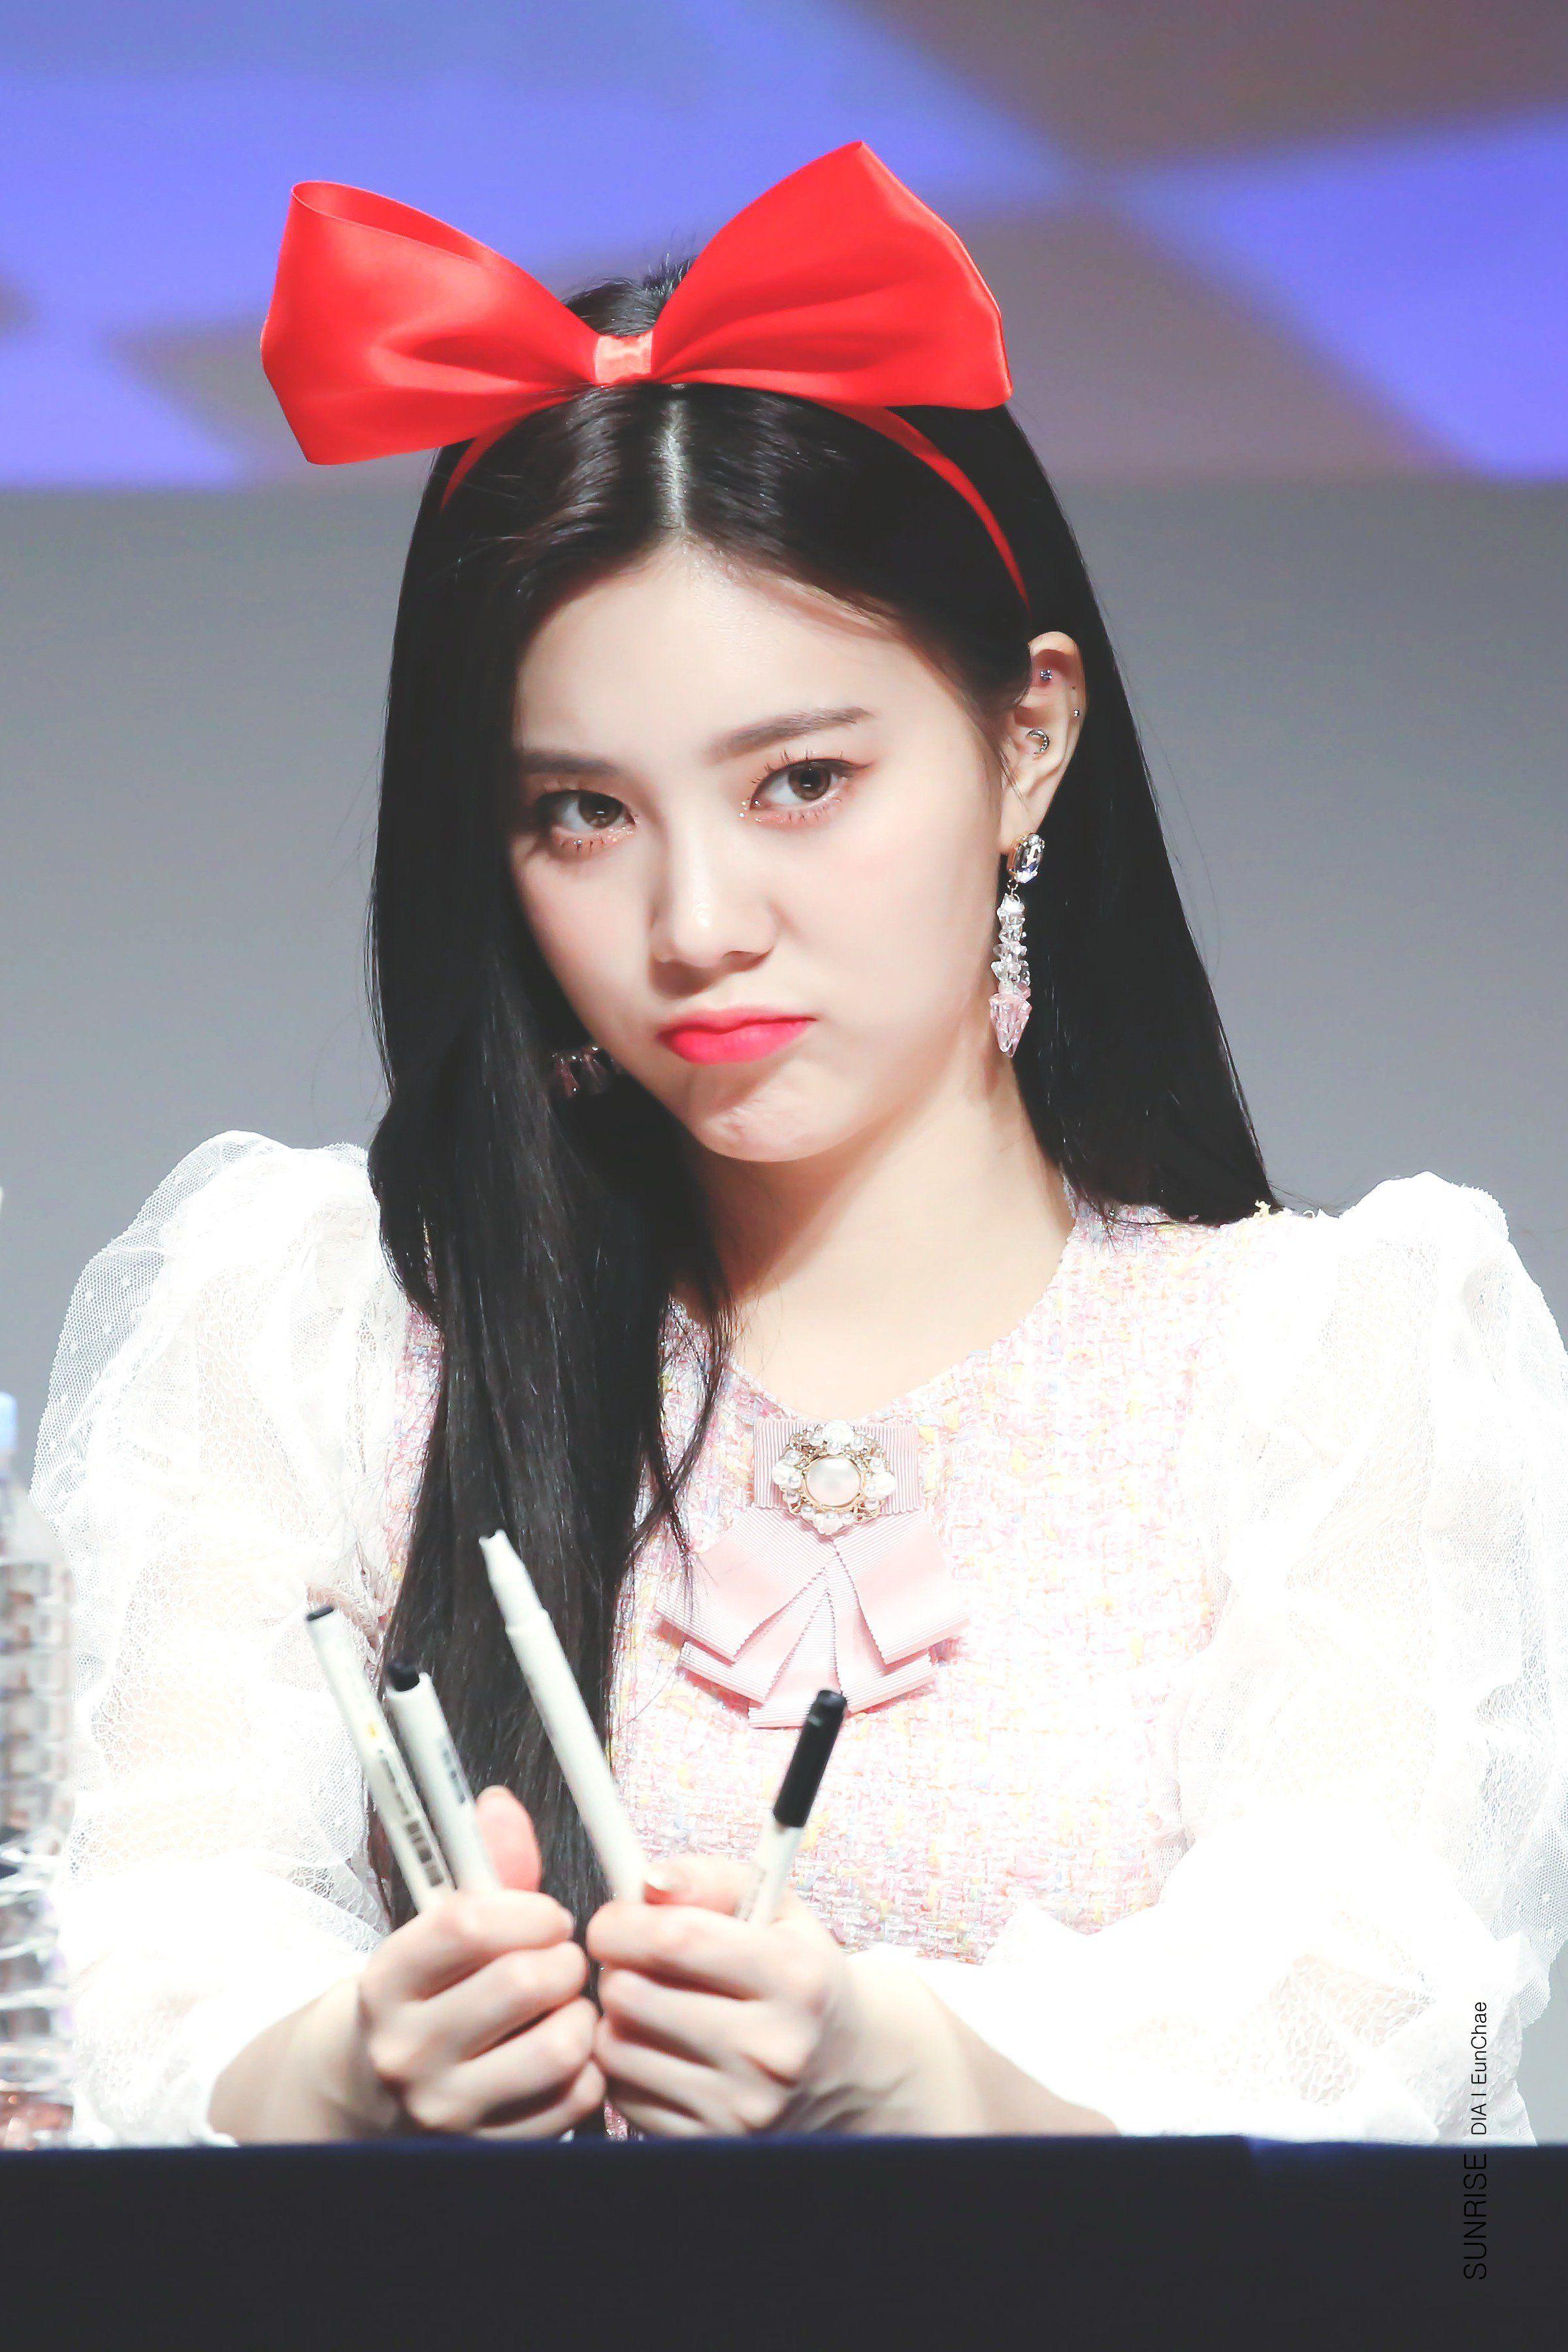 Eunchae Kpop Kdrama Bts Exo Kpoparmy Kpop Girls Bts And Exo Korean Idol